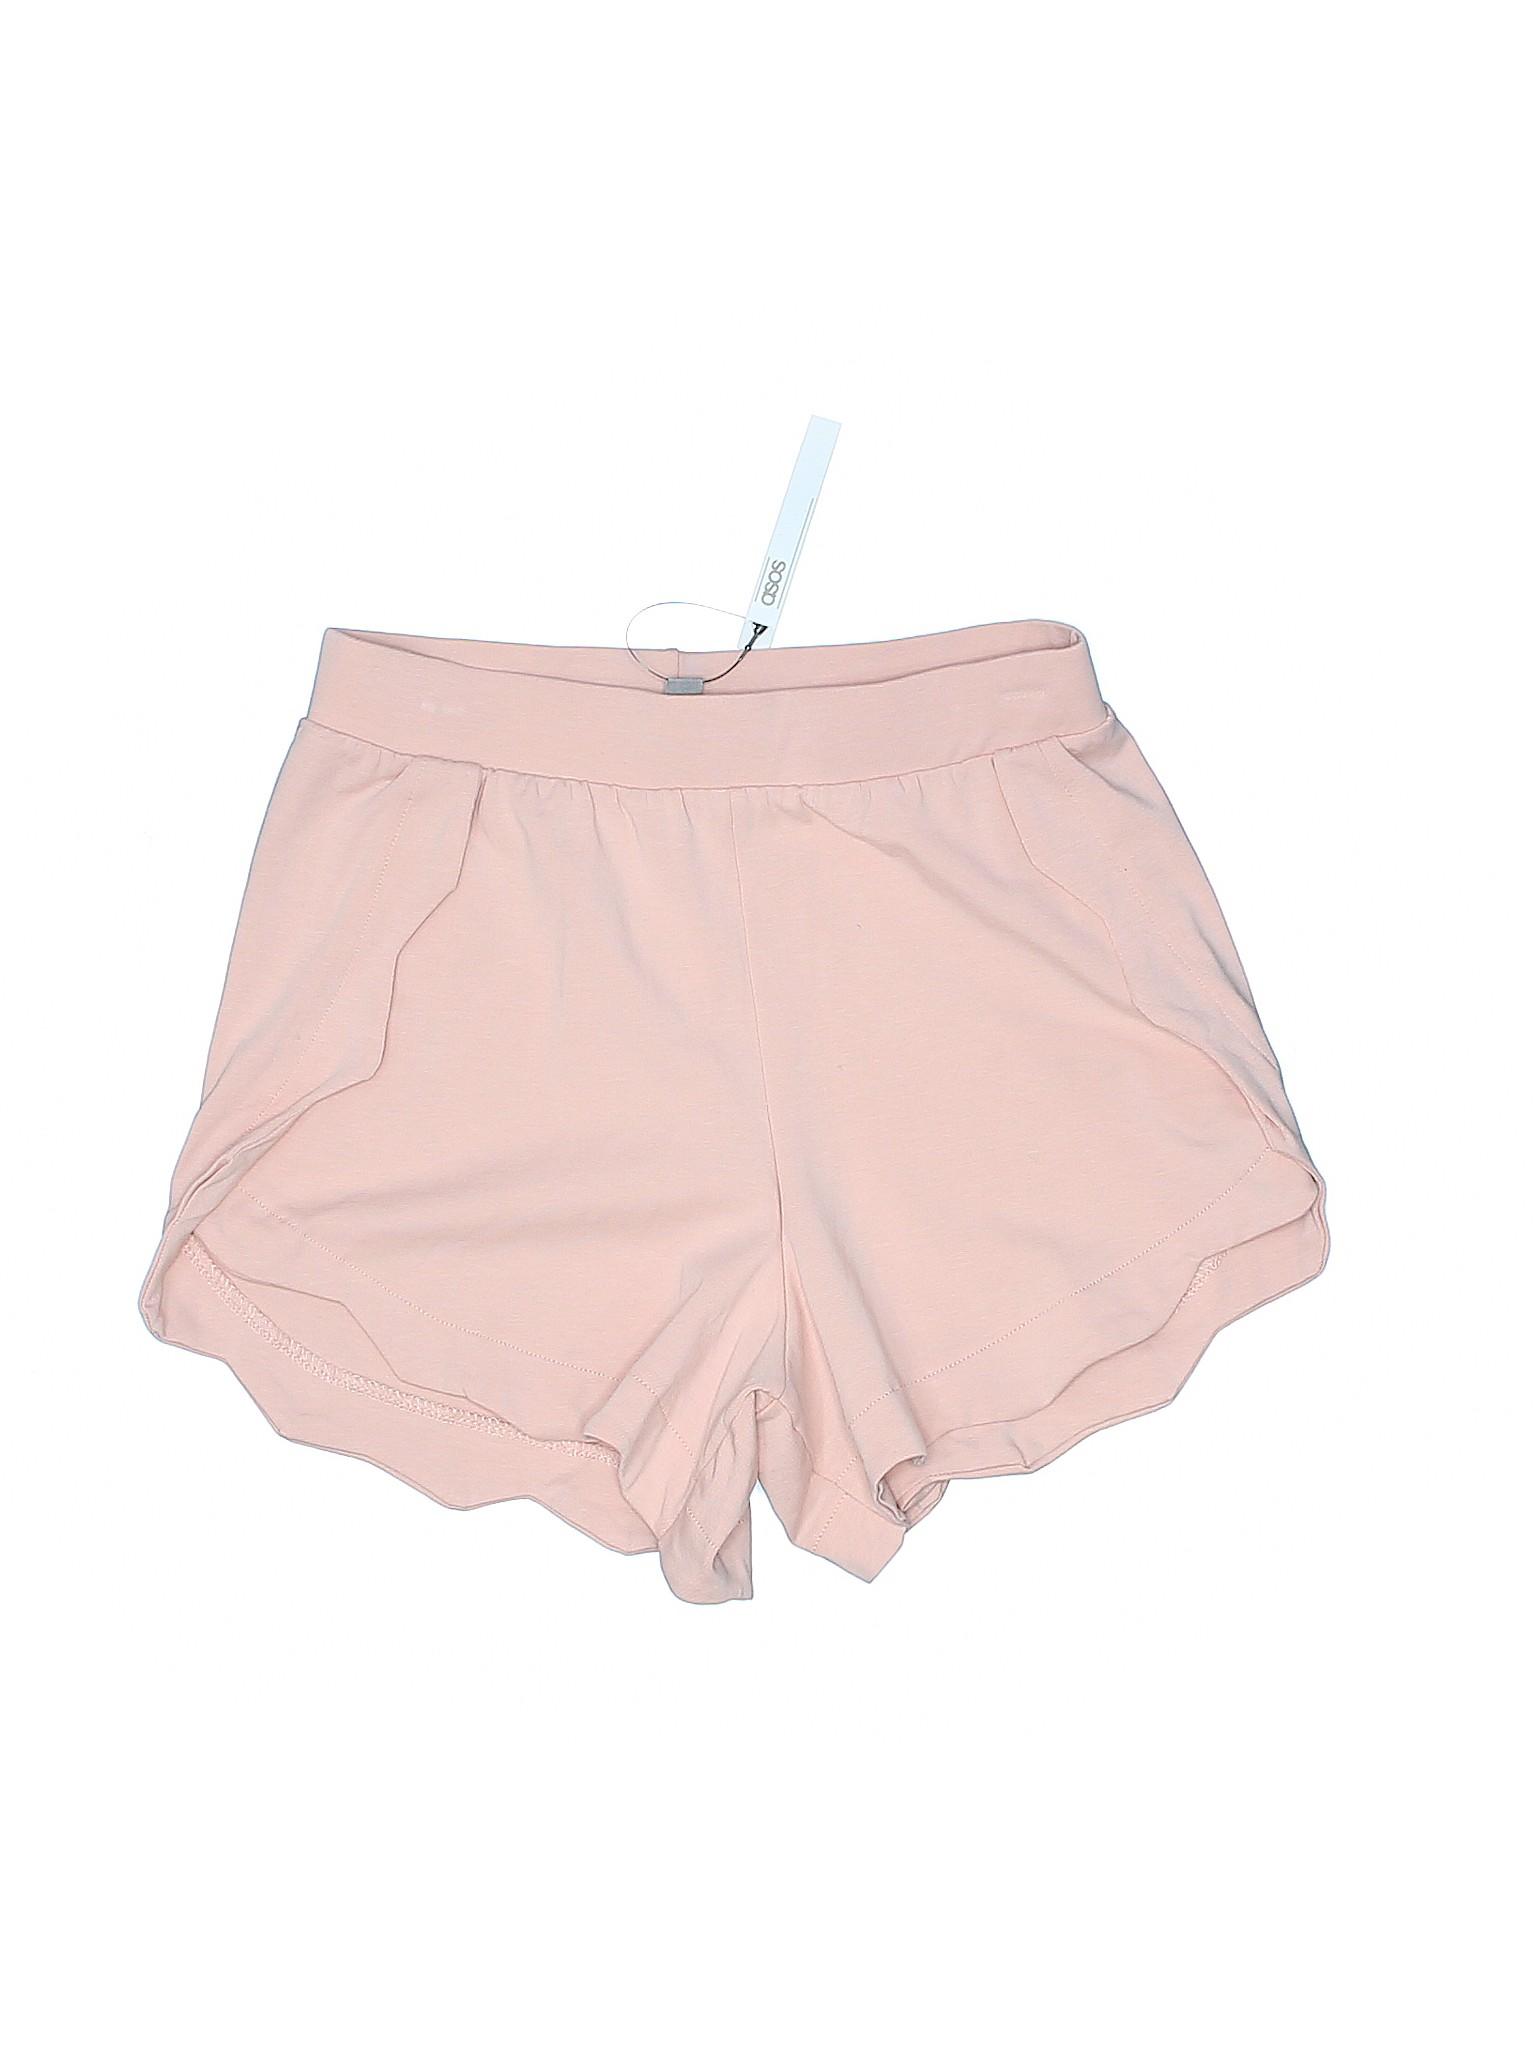 Boutique ASOS ASOS Boutique ASOS Shorts ASOS Boutique Shorts Boutique Shorts Shorts ASOS Boutique rAwqErY